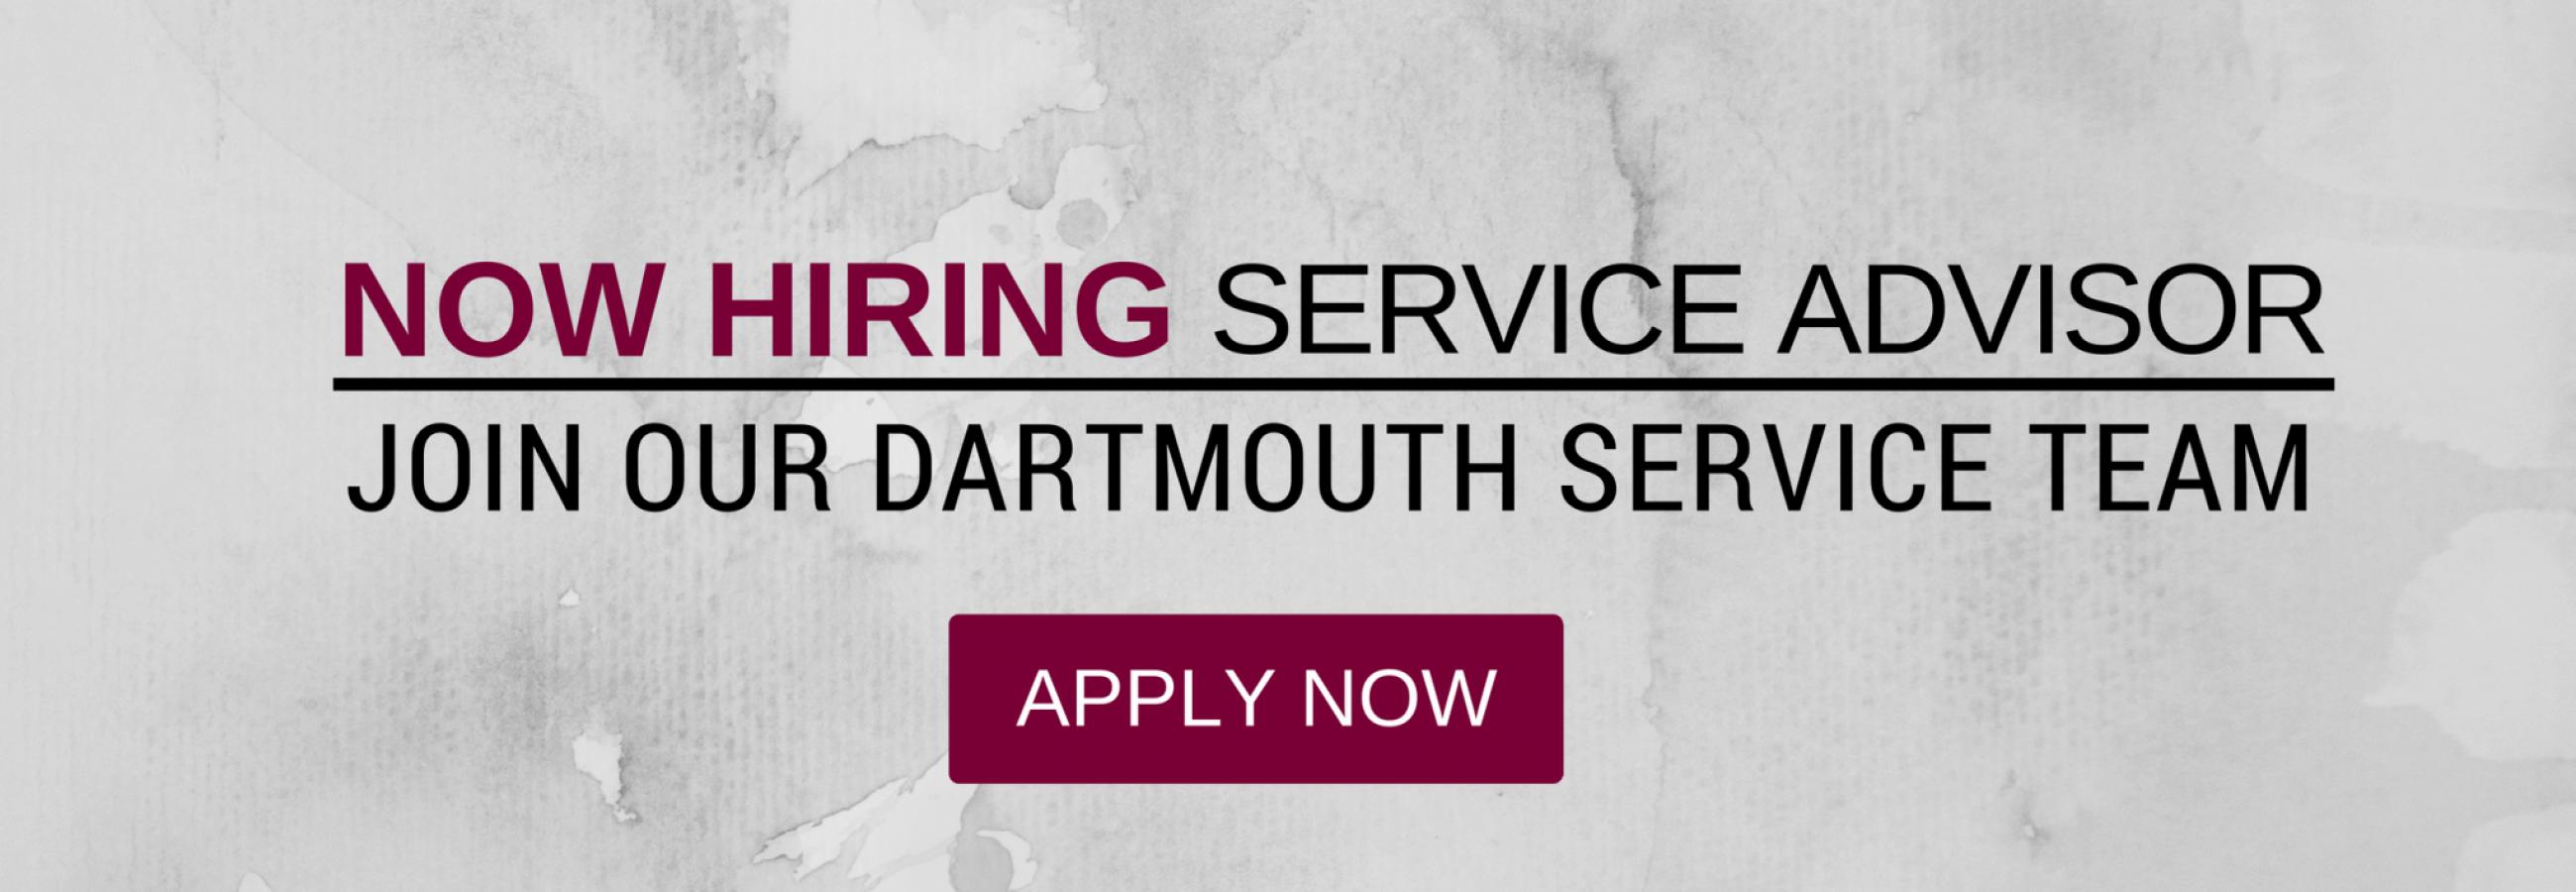 Recruitment_Service Advisor Dartmouth